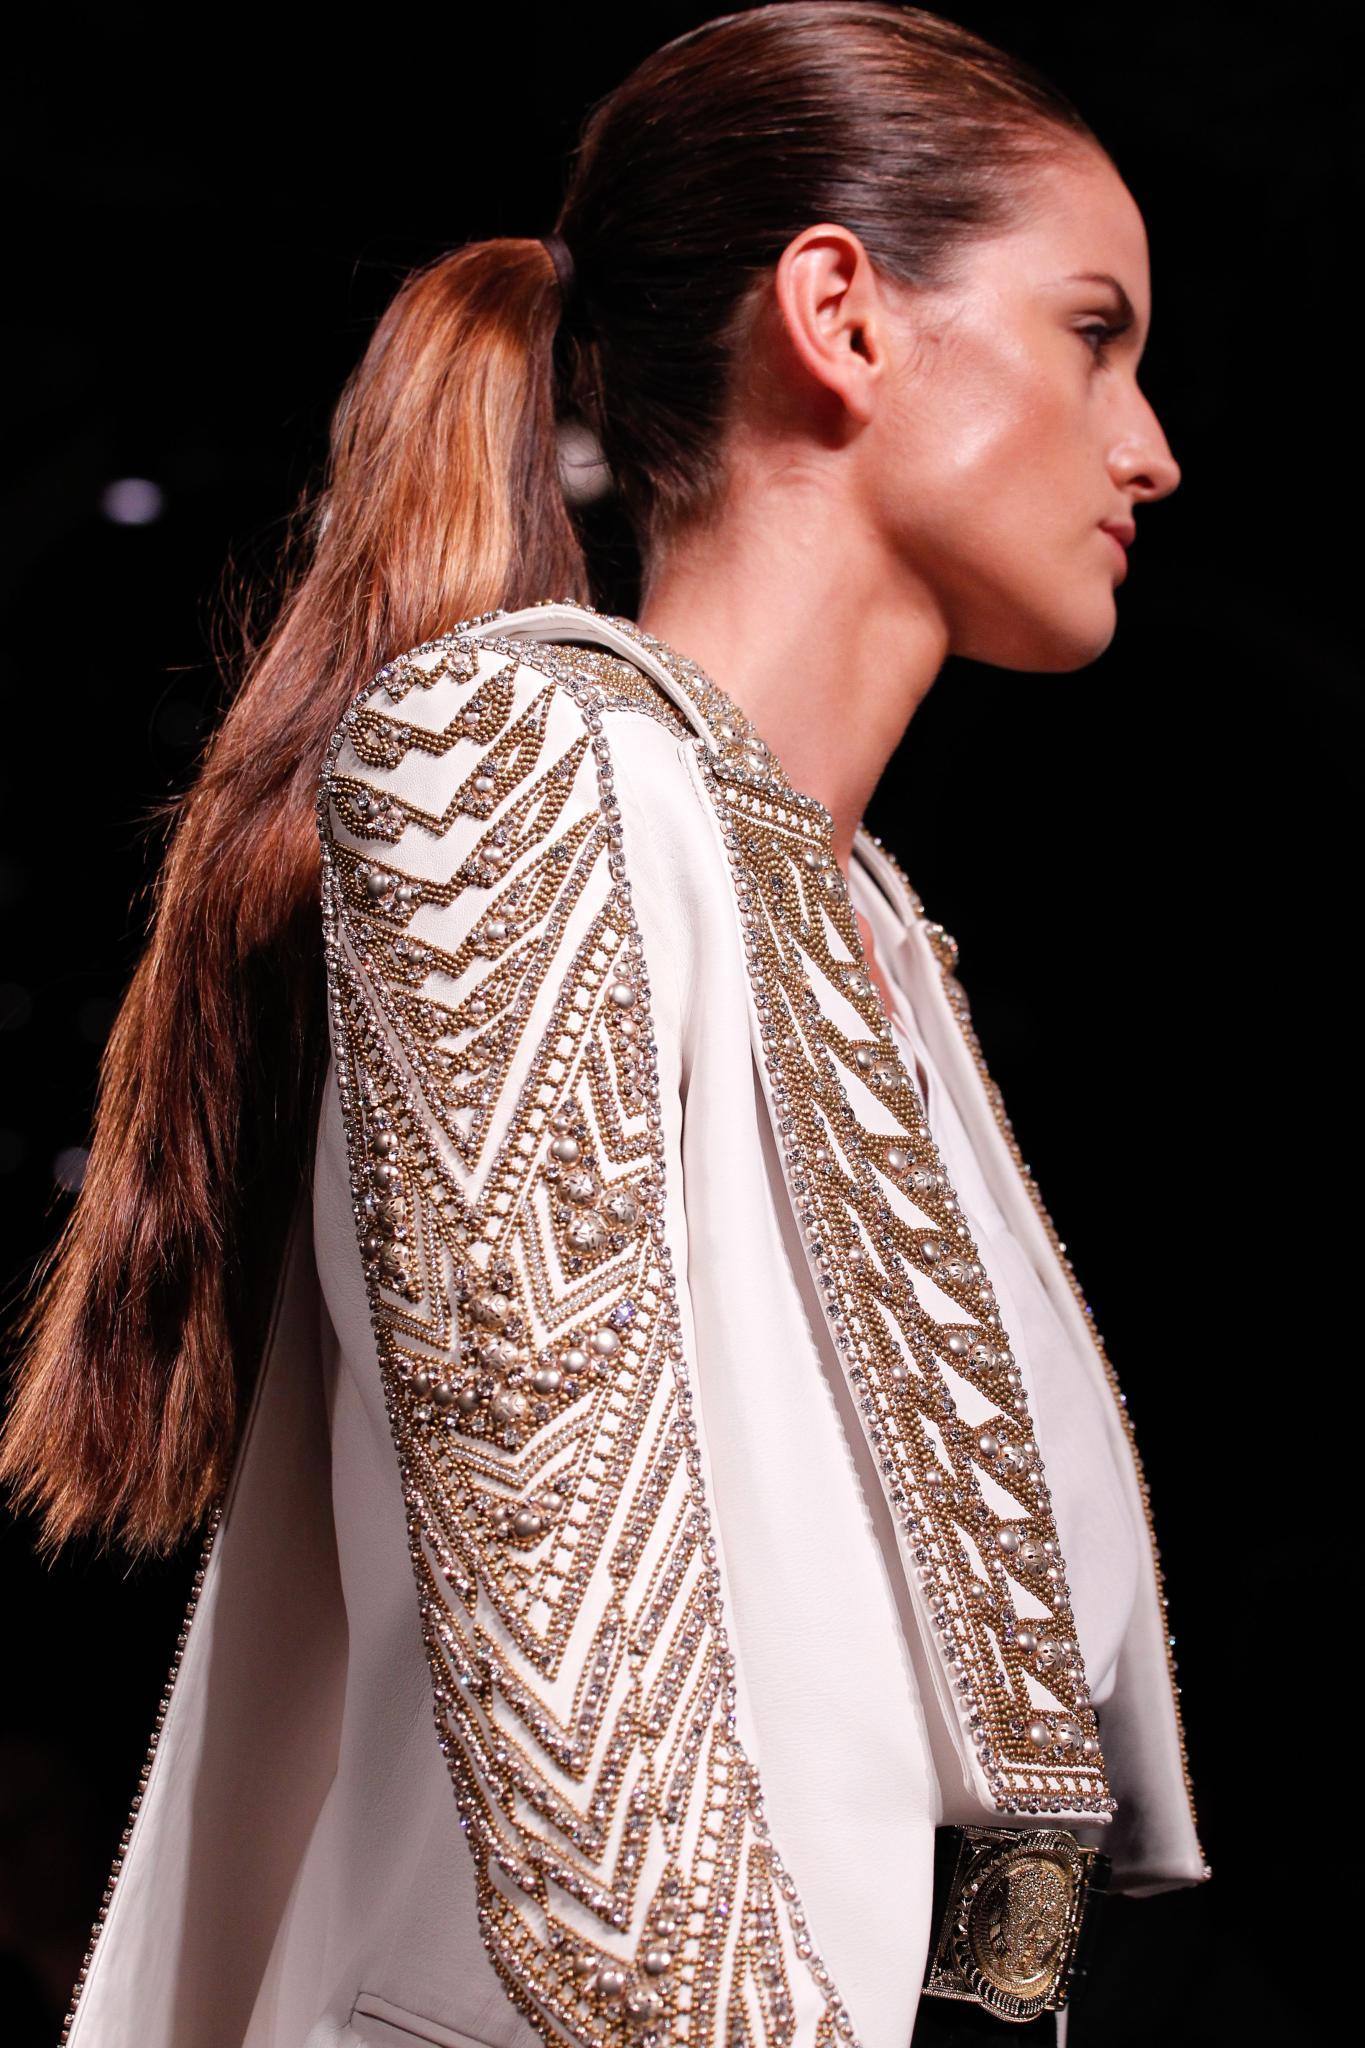 Vista de costado, cabello castaño con ponytail